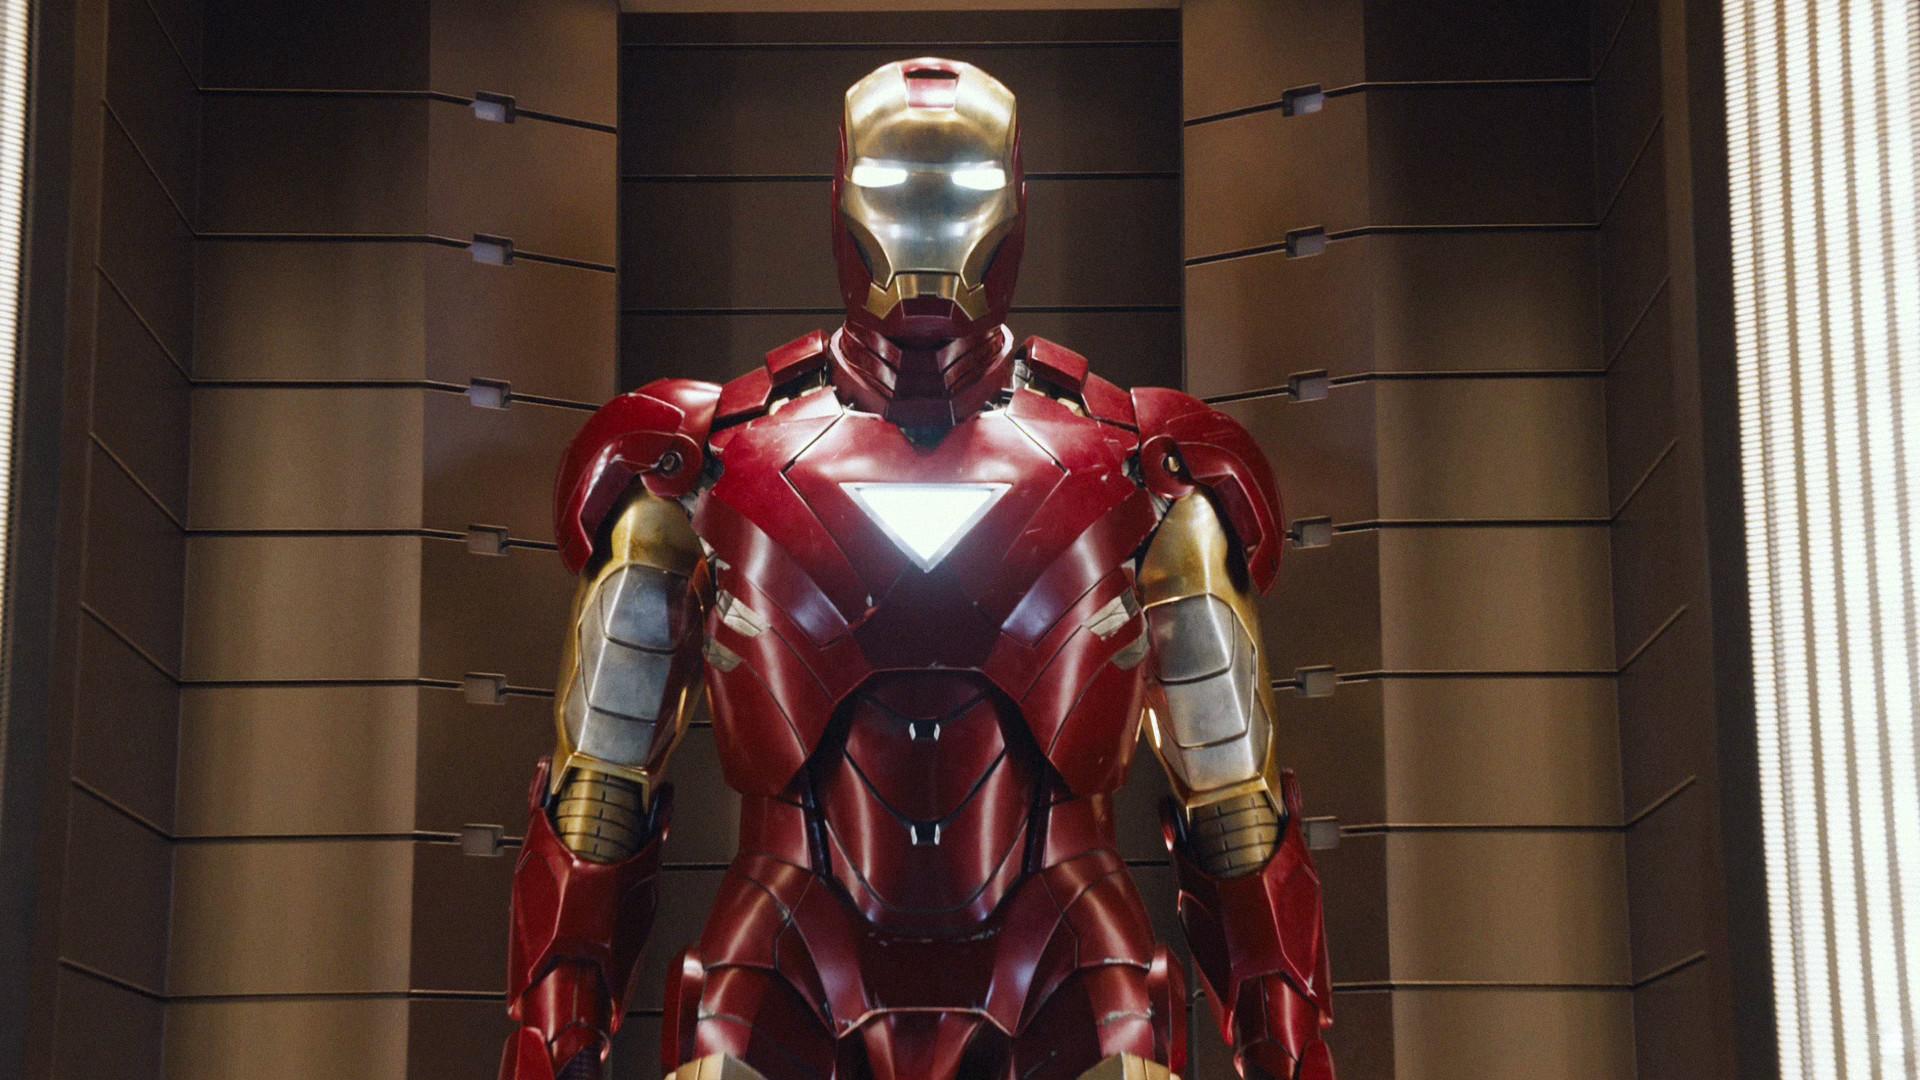 Iron Man Wallpaper 1920x1080 70 Images